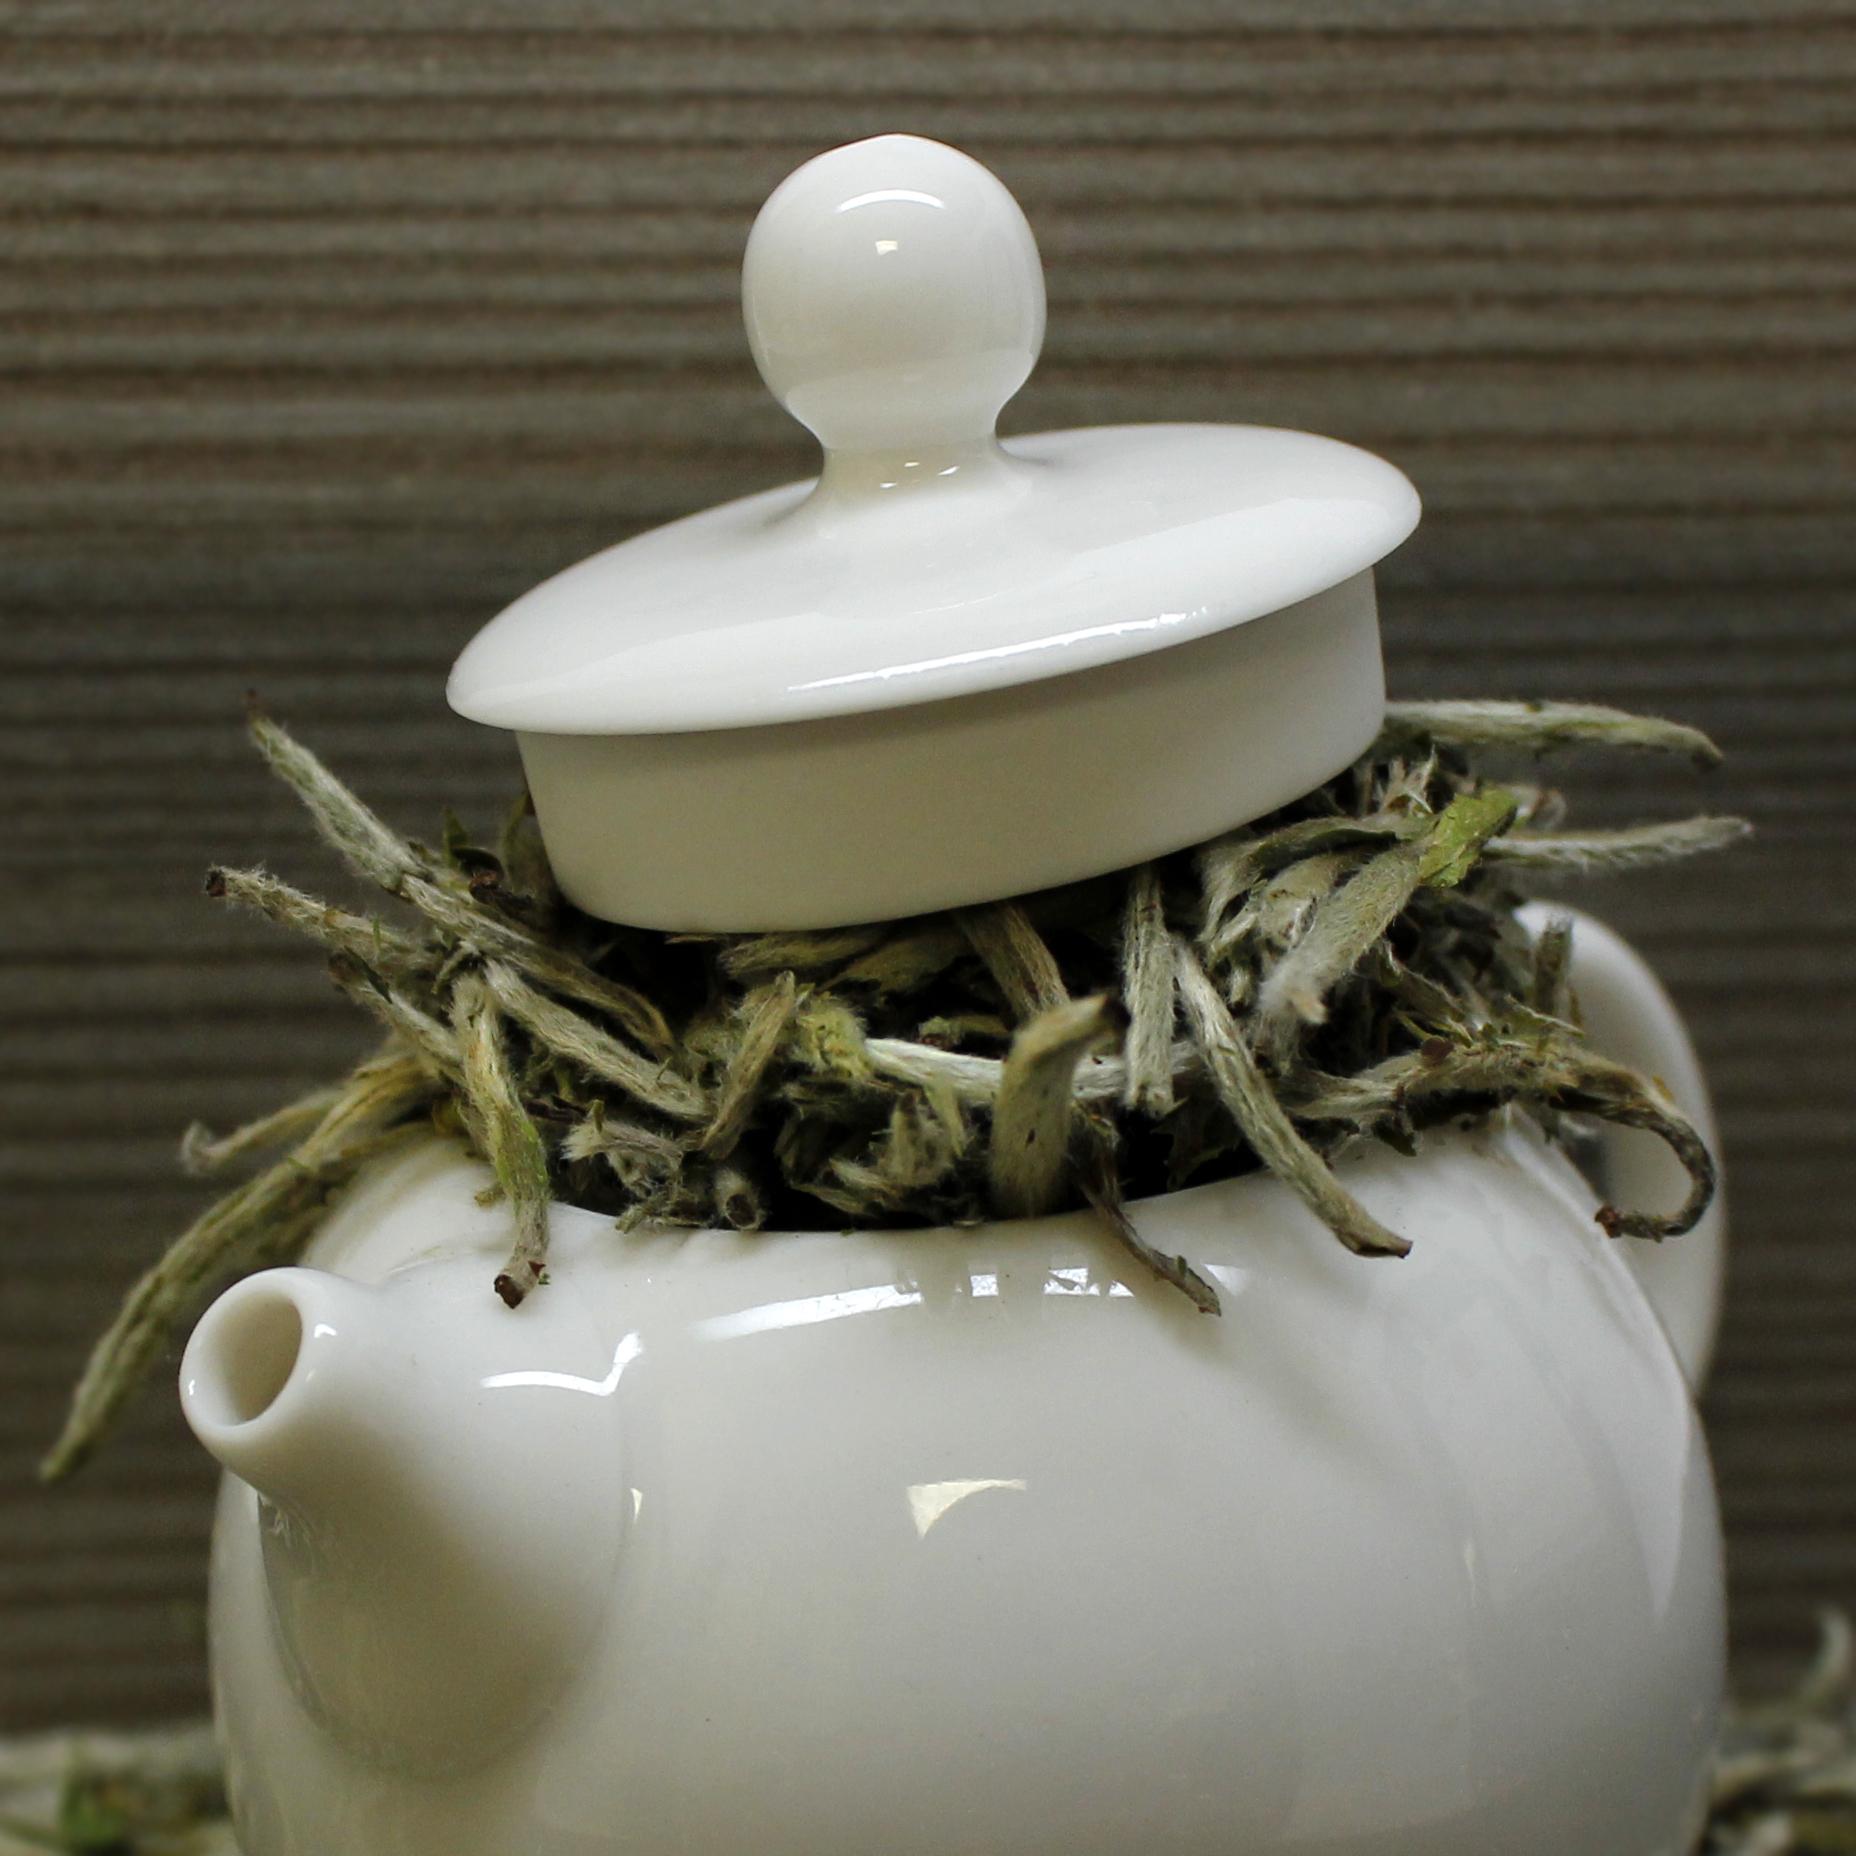 silver-needles-yin-zhen-white-whole-leaf-loose-tea-2019a-itw1.jpg